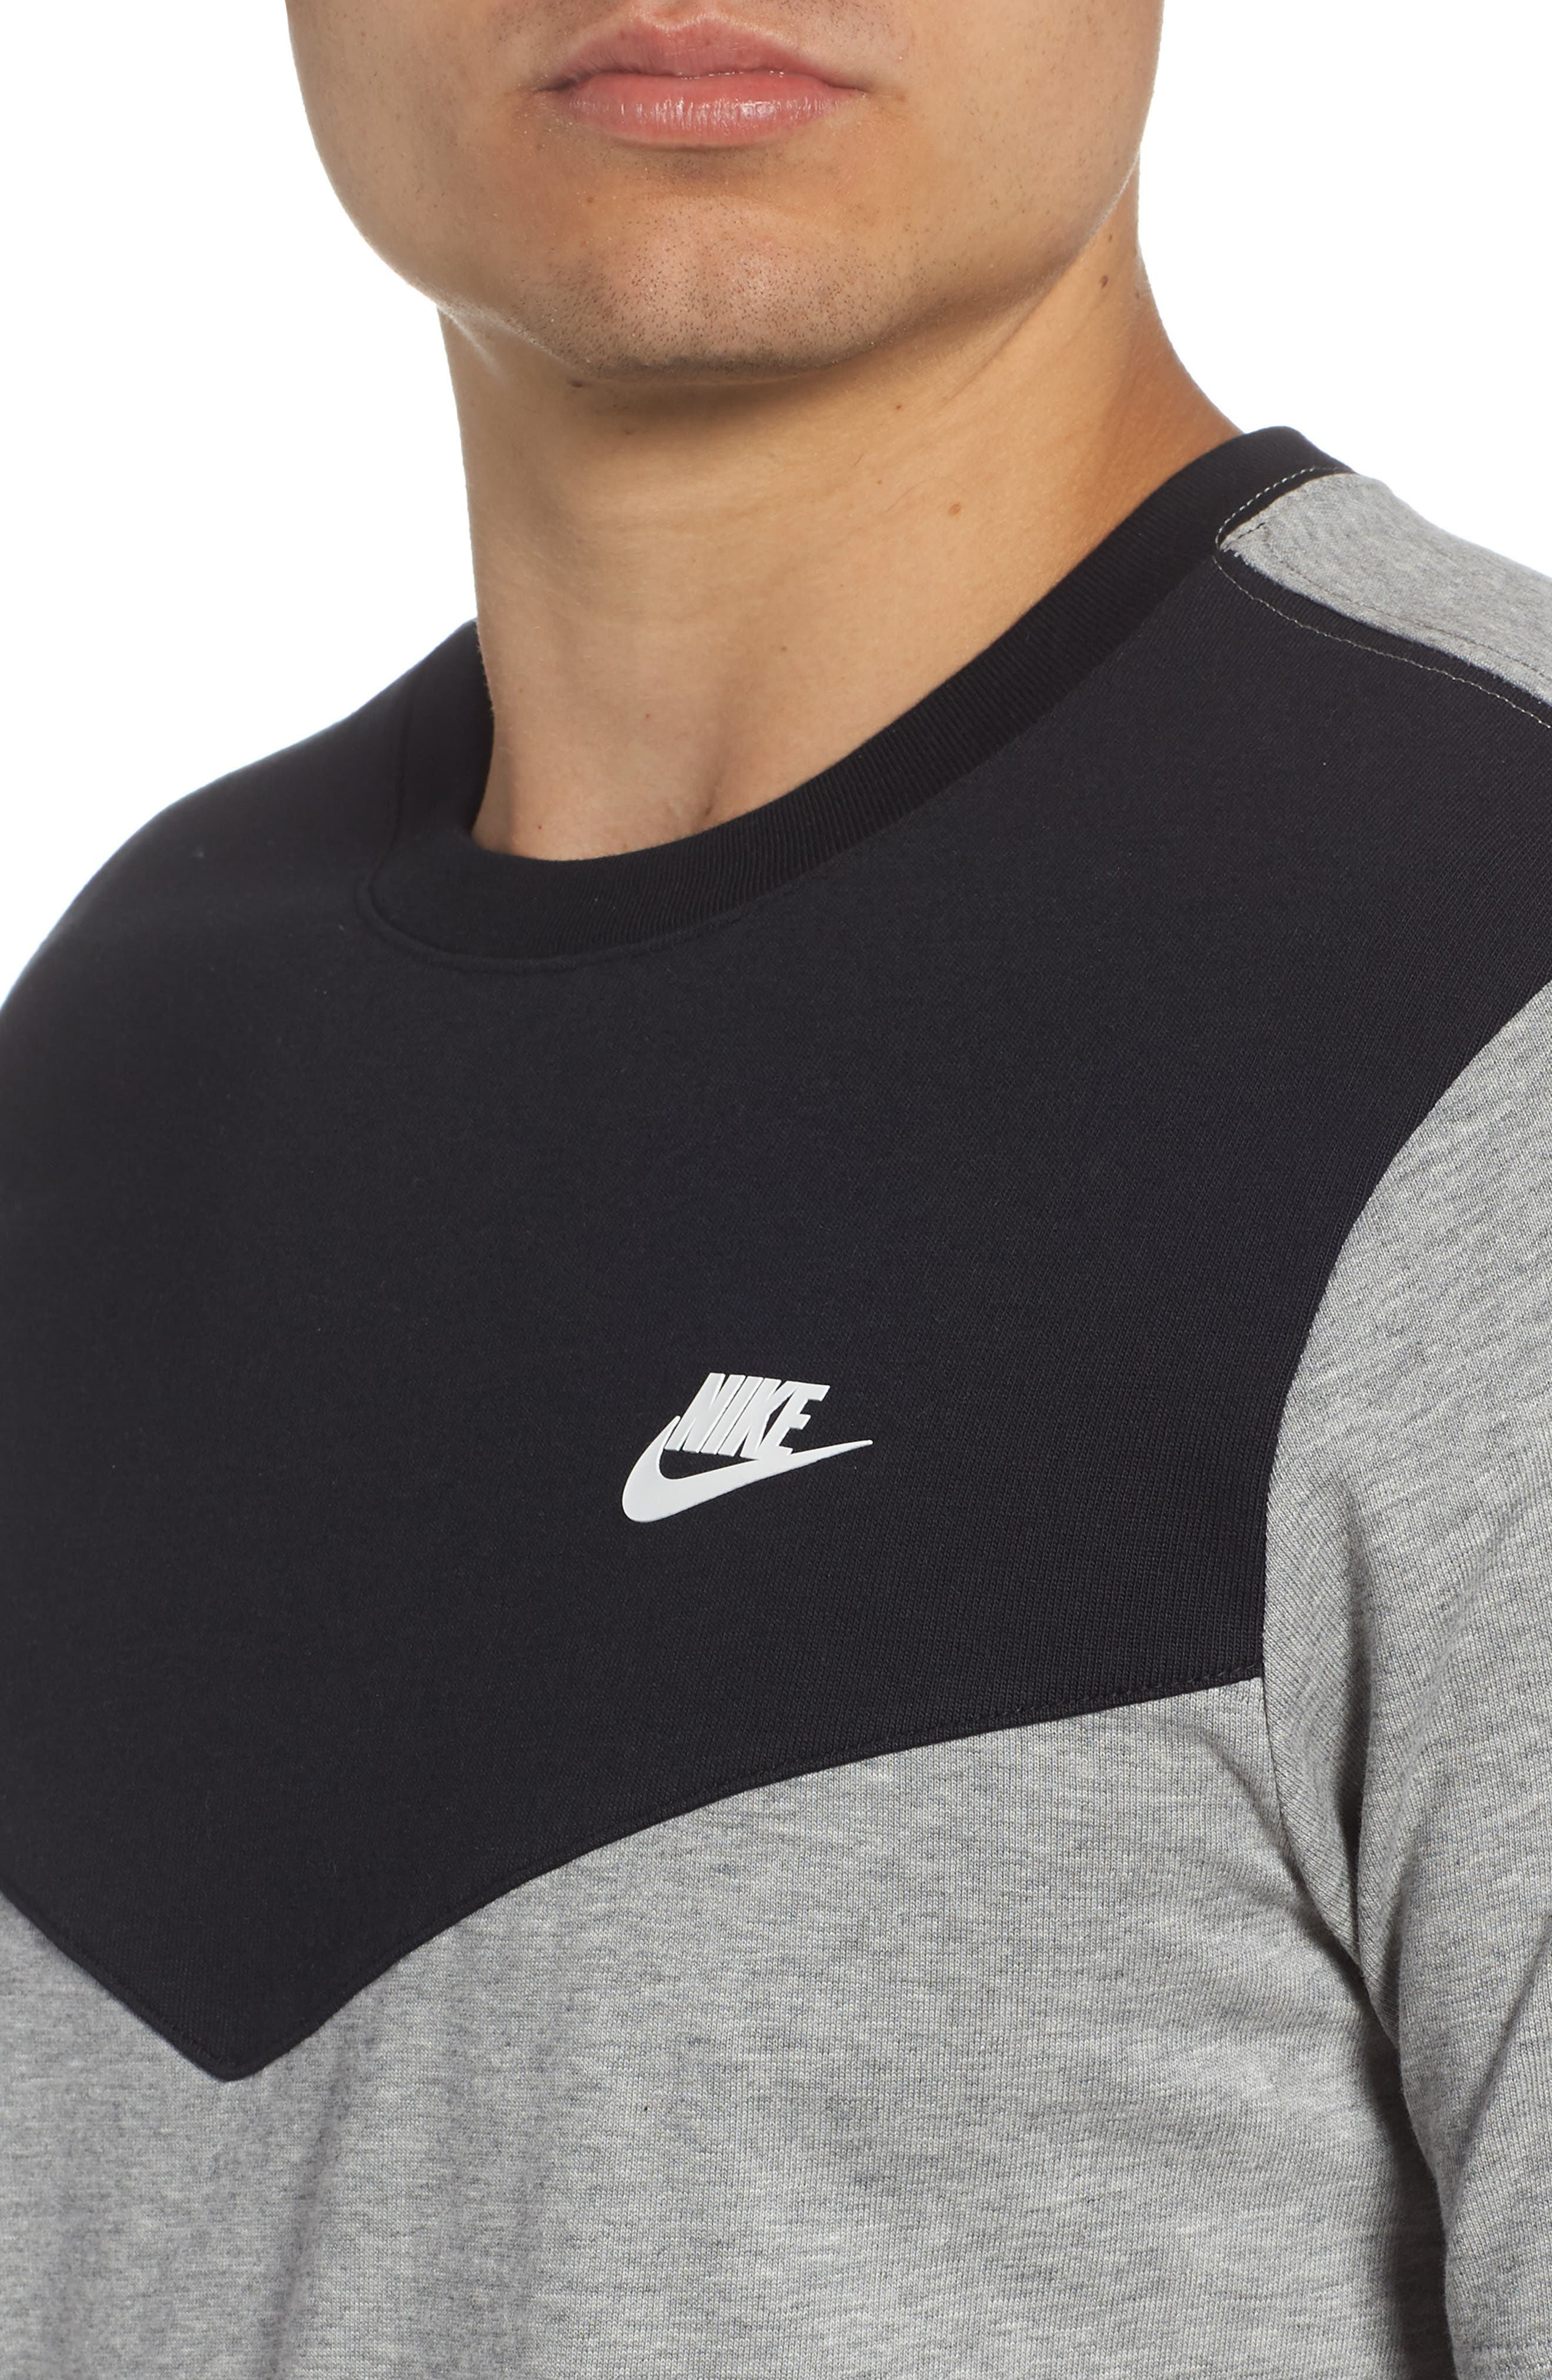 Windrunner Colorblocked T-Shirt,                             Alternate thumbnail 4, color,                             BLACK/ DK GREY HEATHER/ WHITE